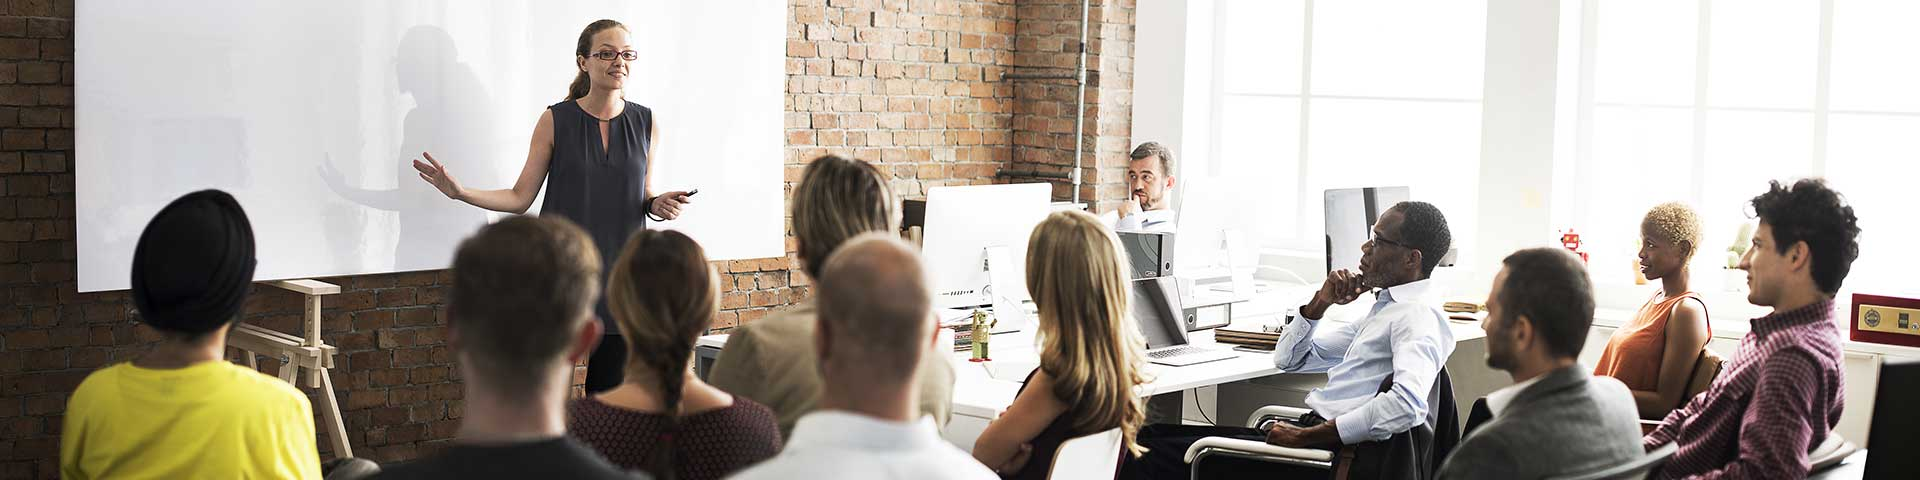 workshop-kits-center-for-creative-leadership.jpg